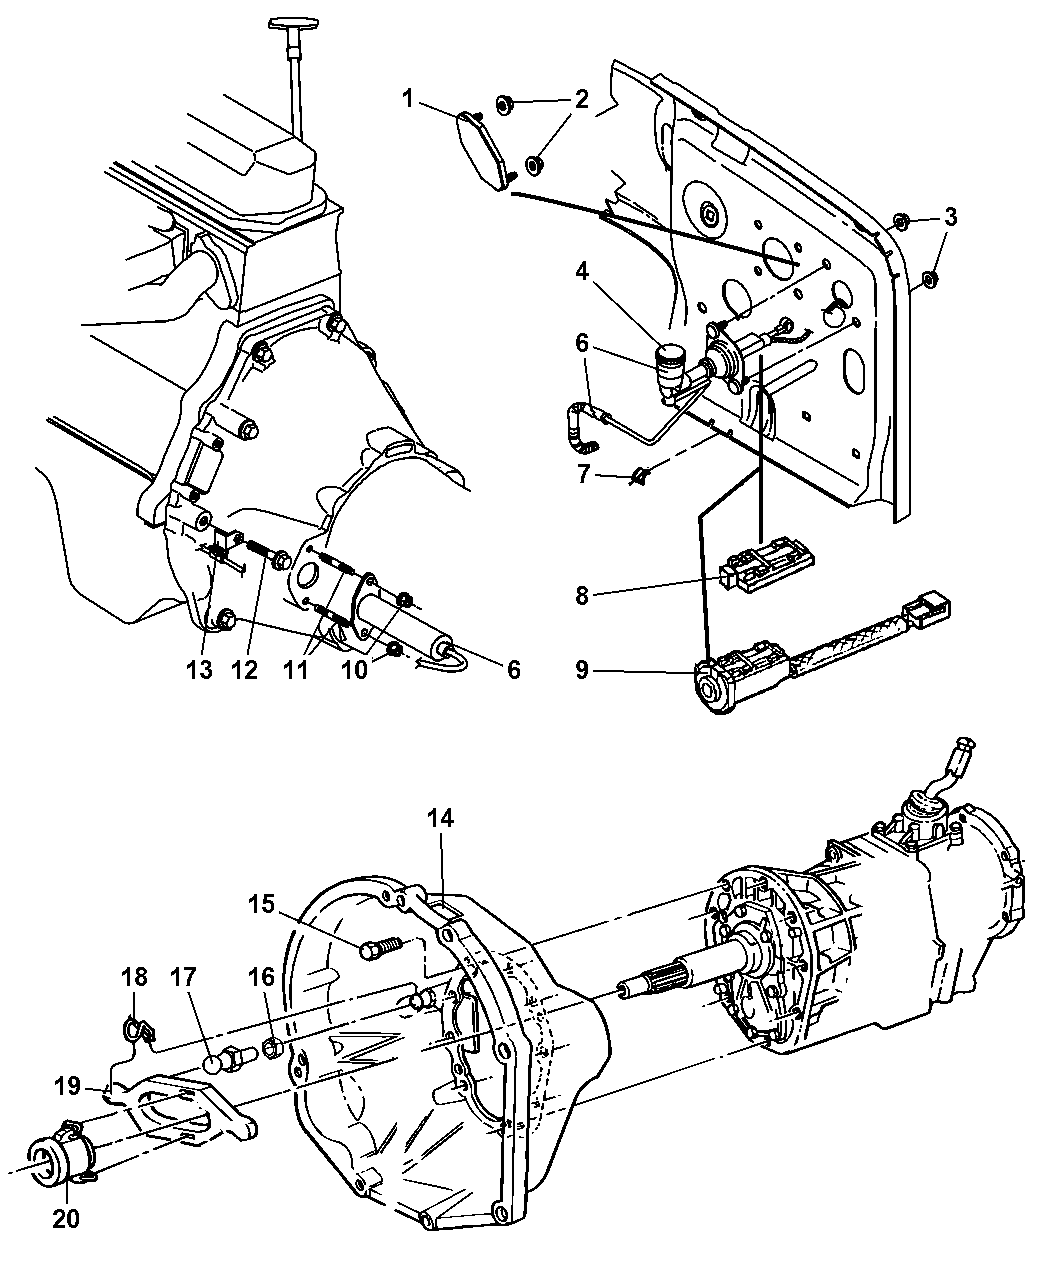 jeep wrangler 40 engine diagram